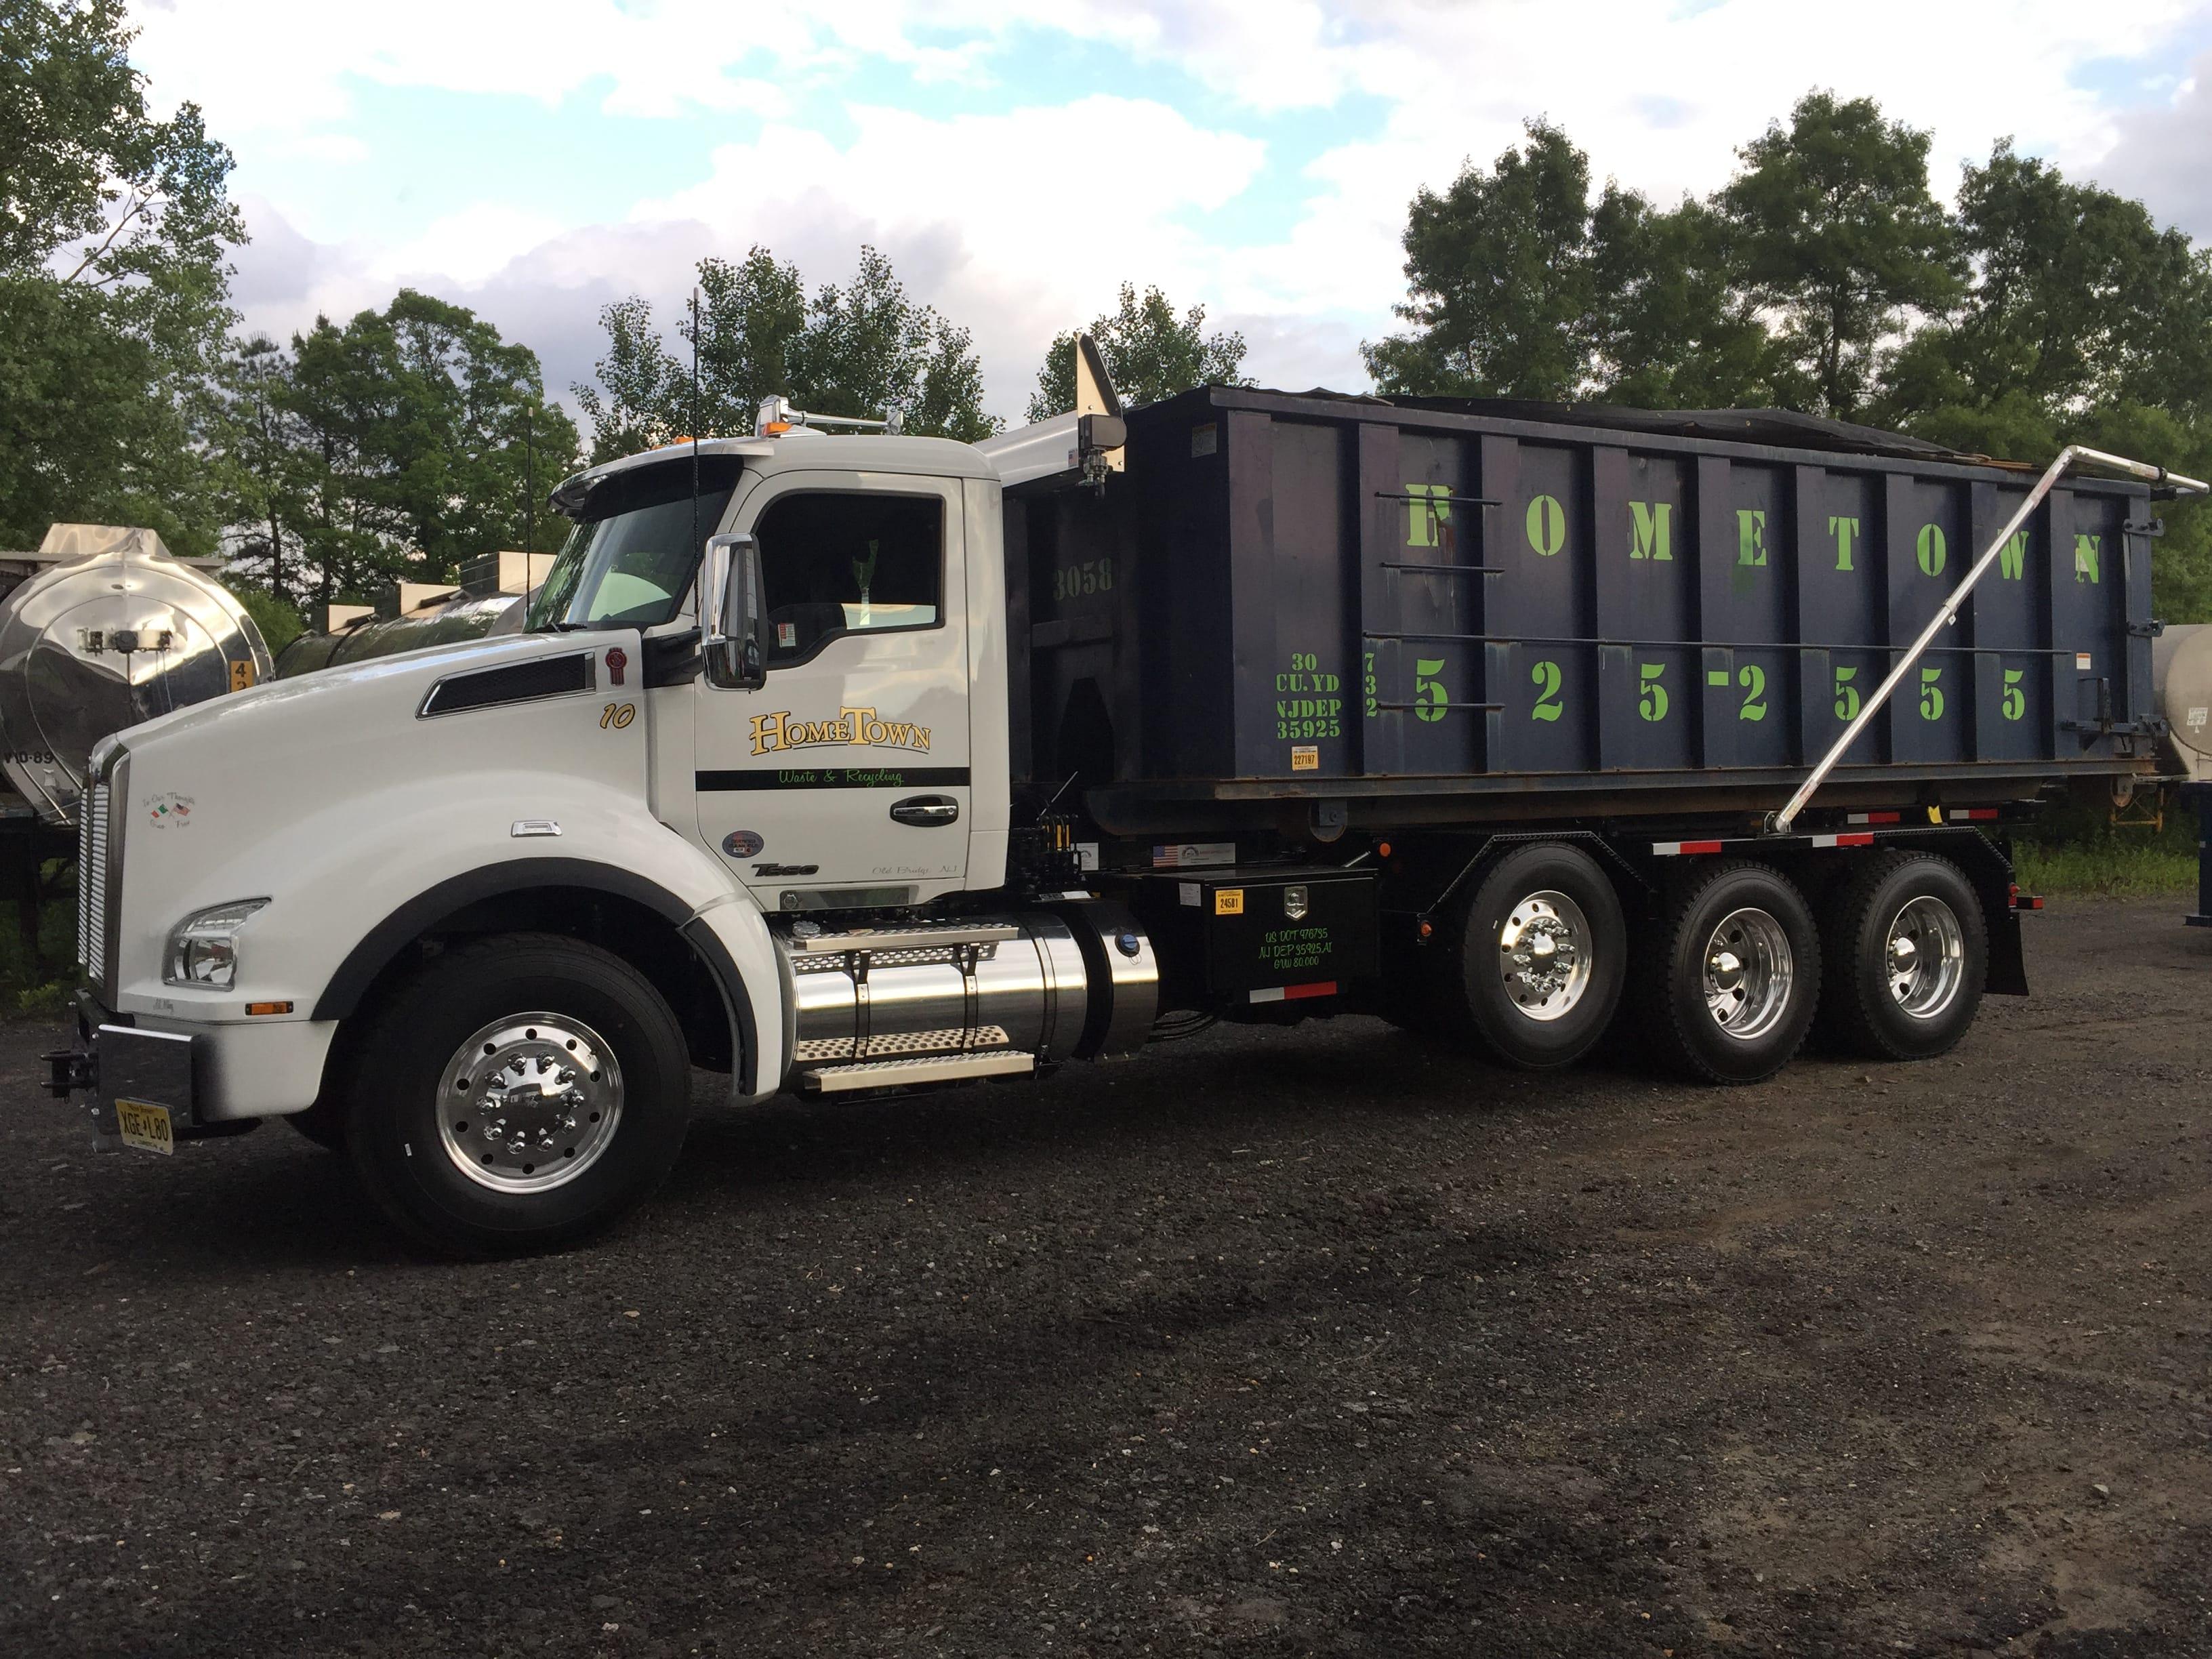 30 Yard Dumpster Rentals in NJ | Large Dumpsters | Hometown